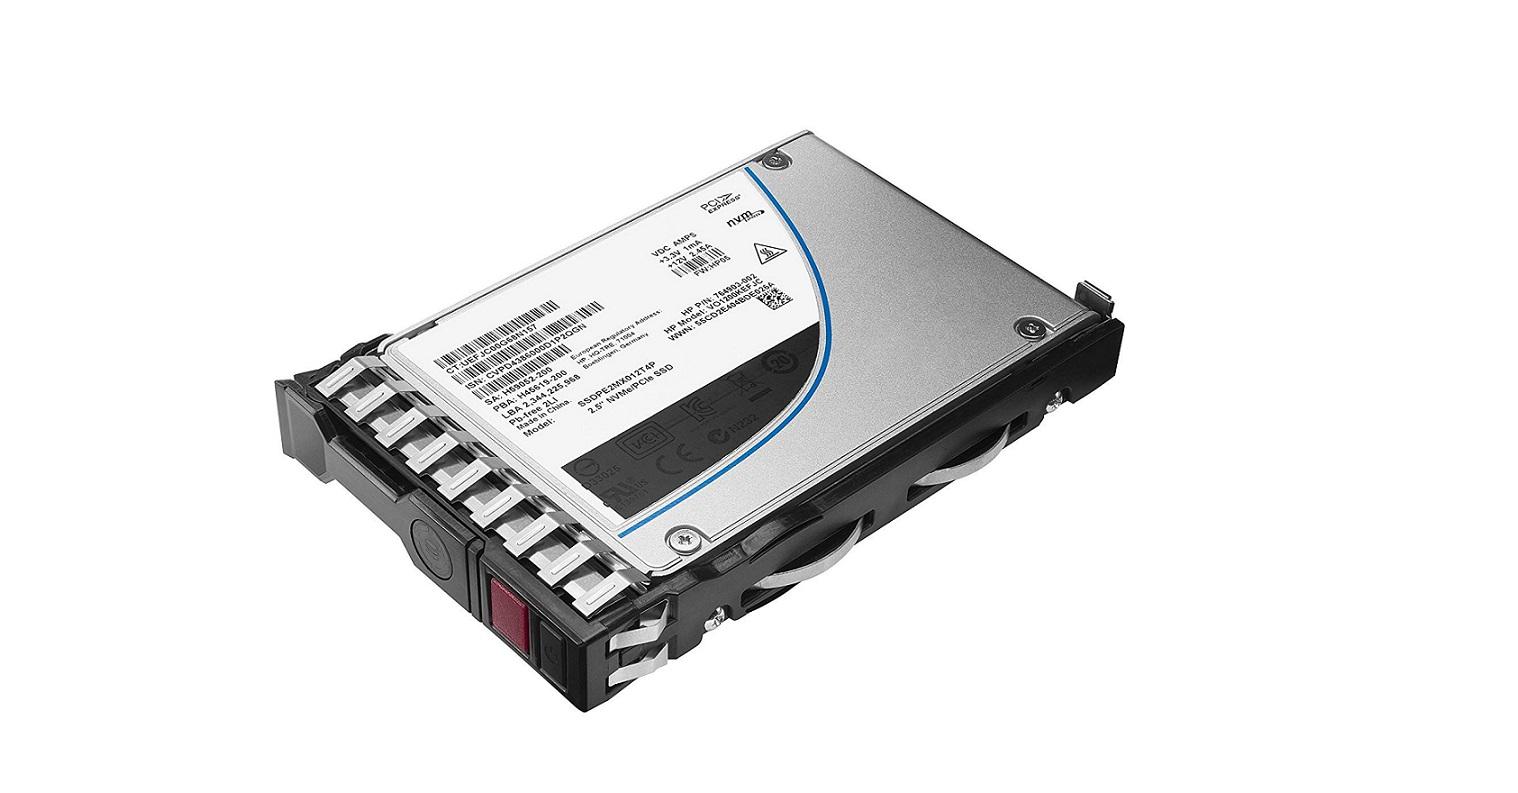 800GB HP 873363-B21 12GB/s SAS SFF 2.5 Hot Swap SSD